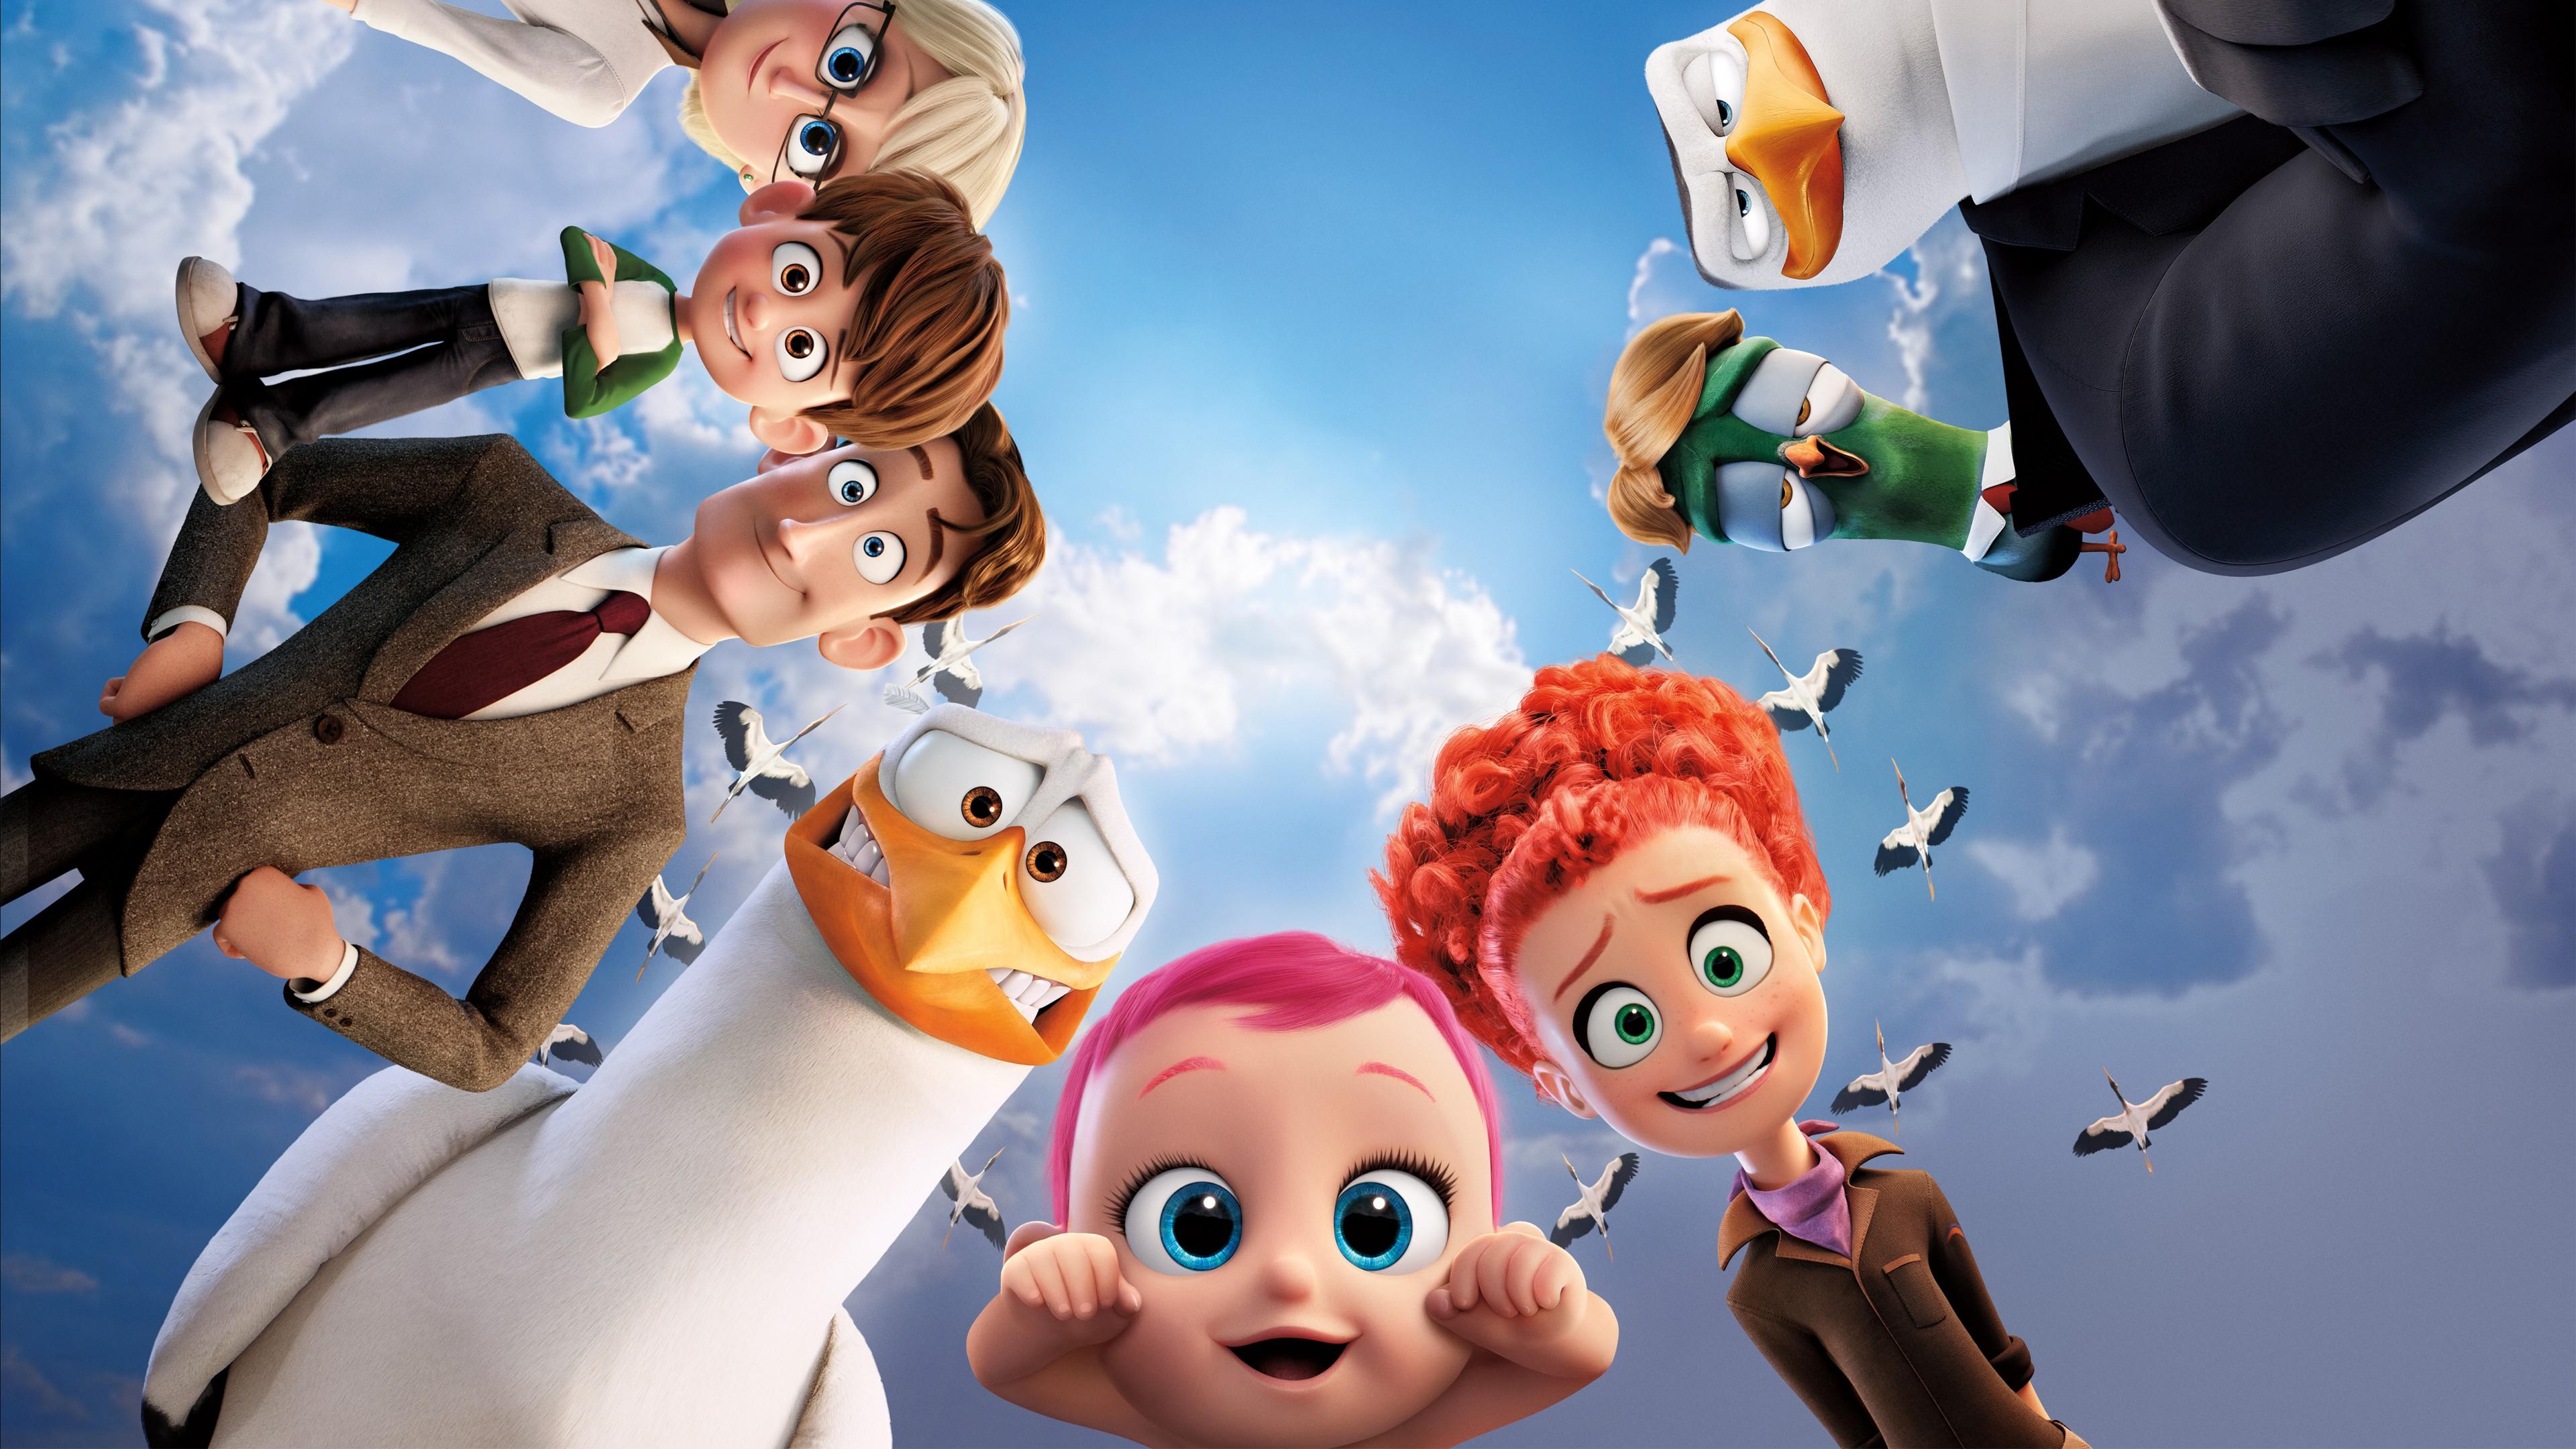 2016 Storks Animated Movie, HD Movies ...